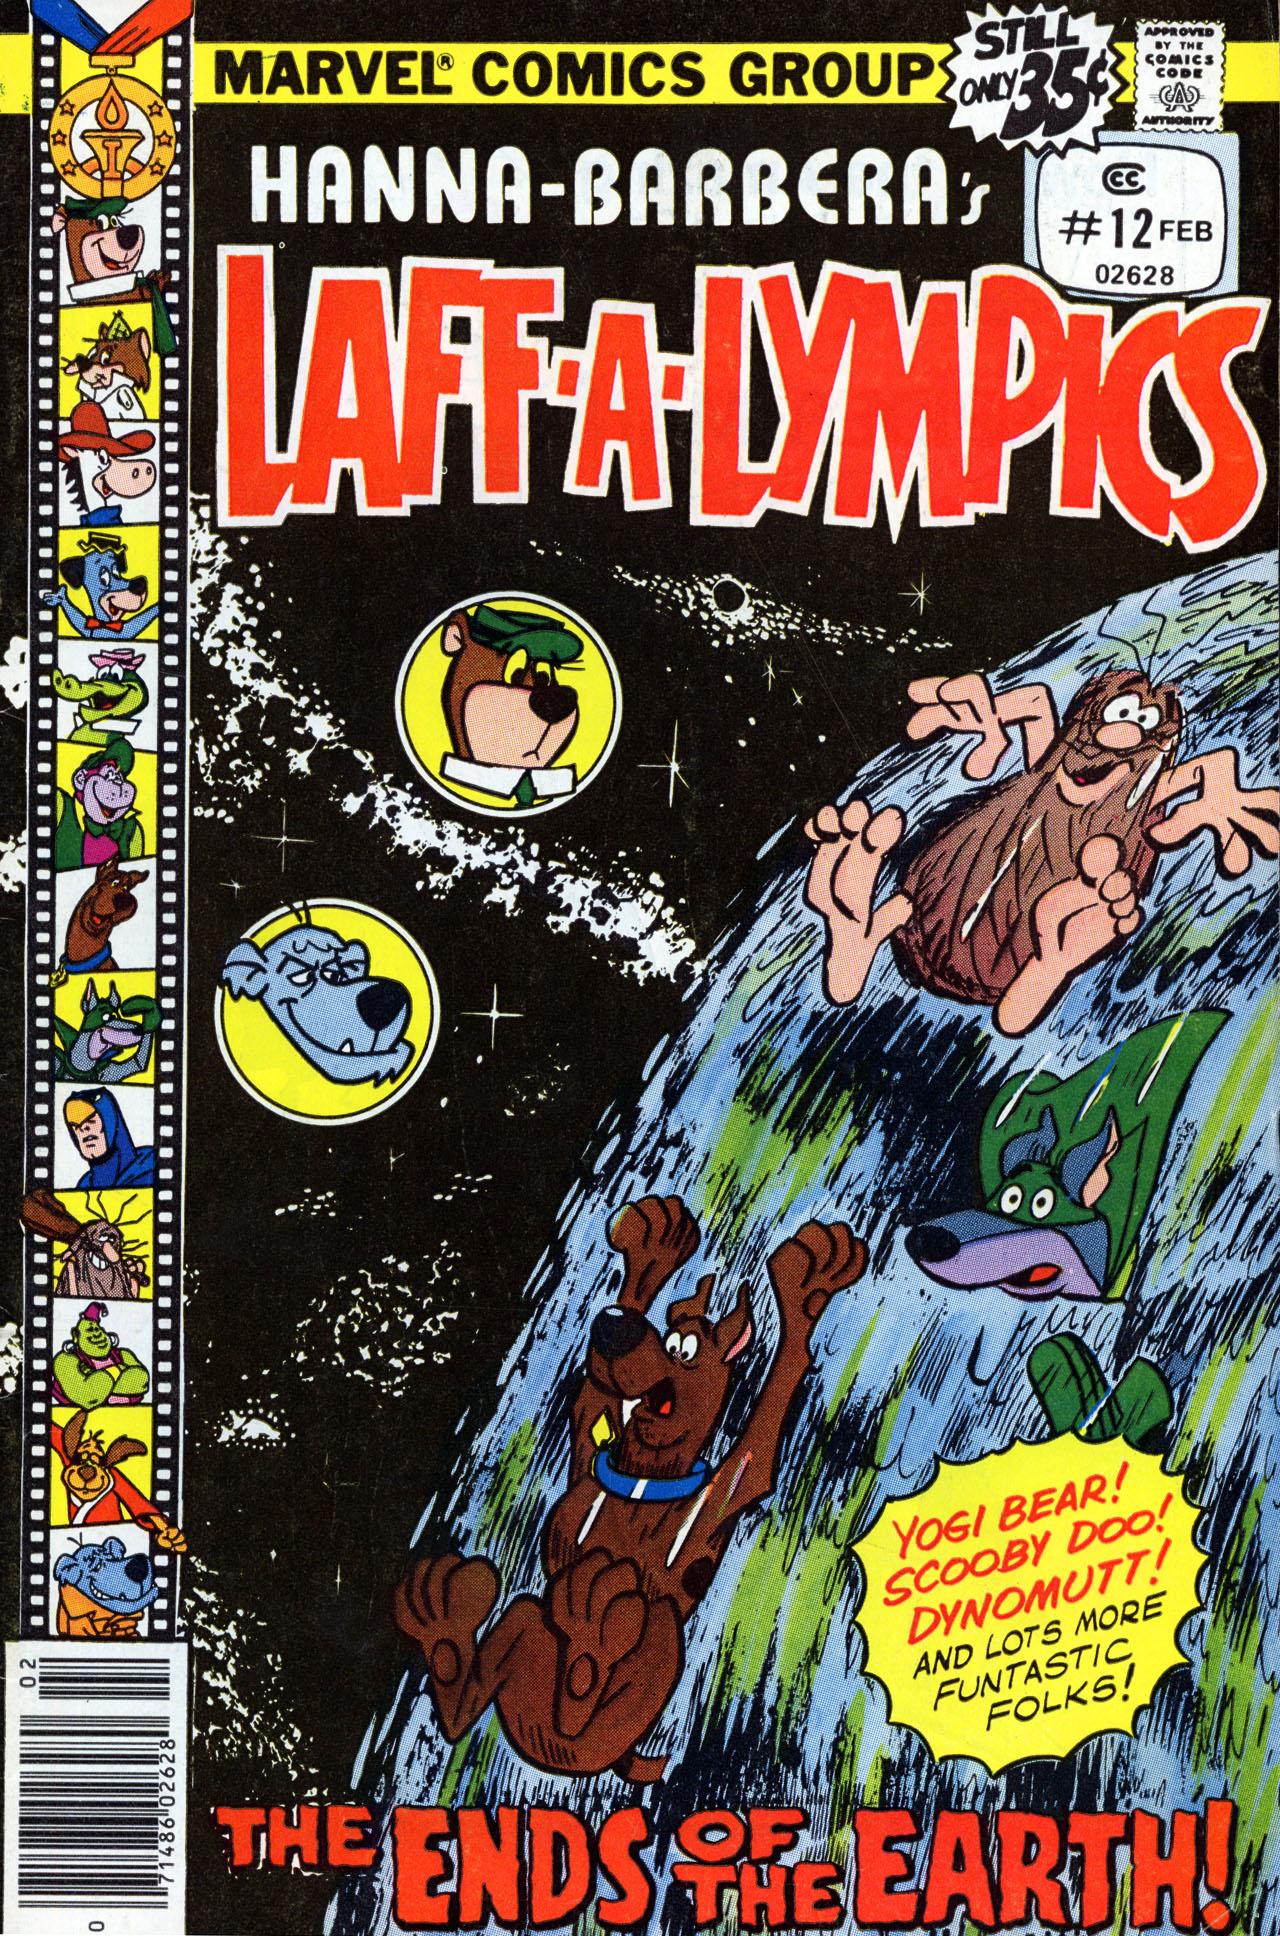 Laff-a-lympics 12 Page 1